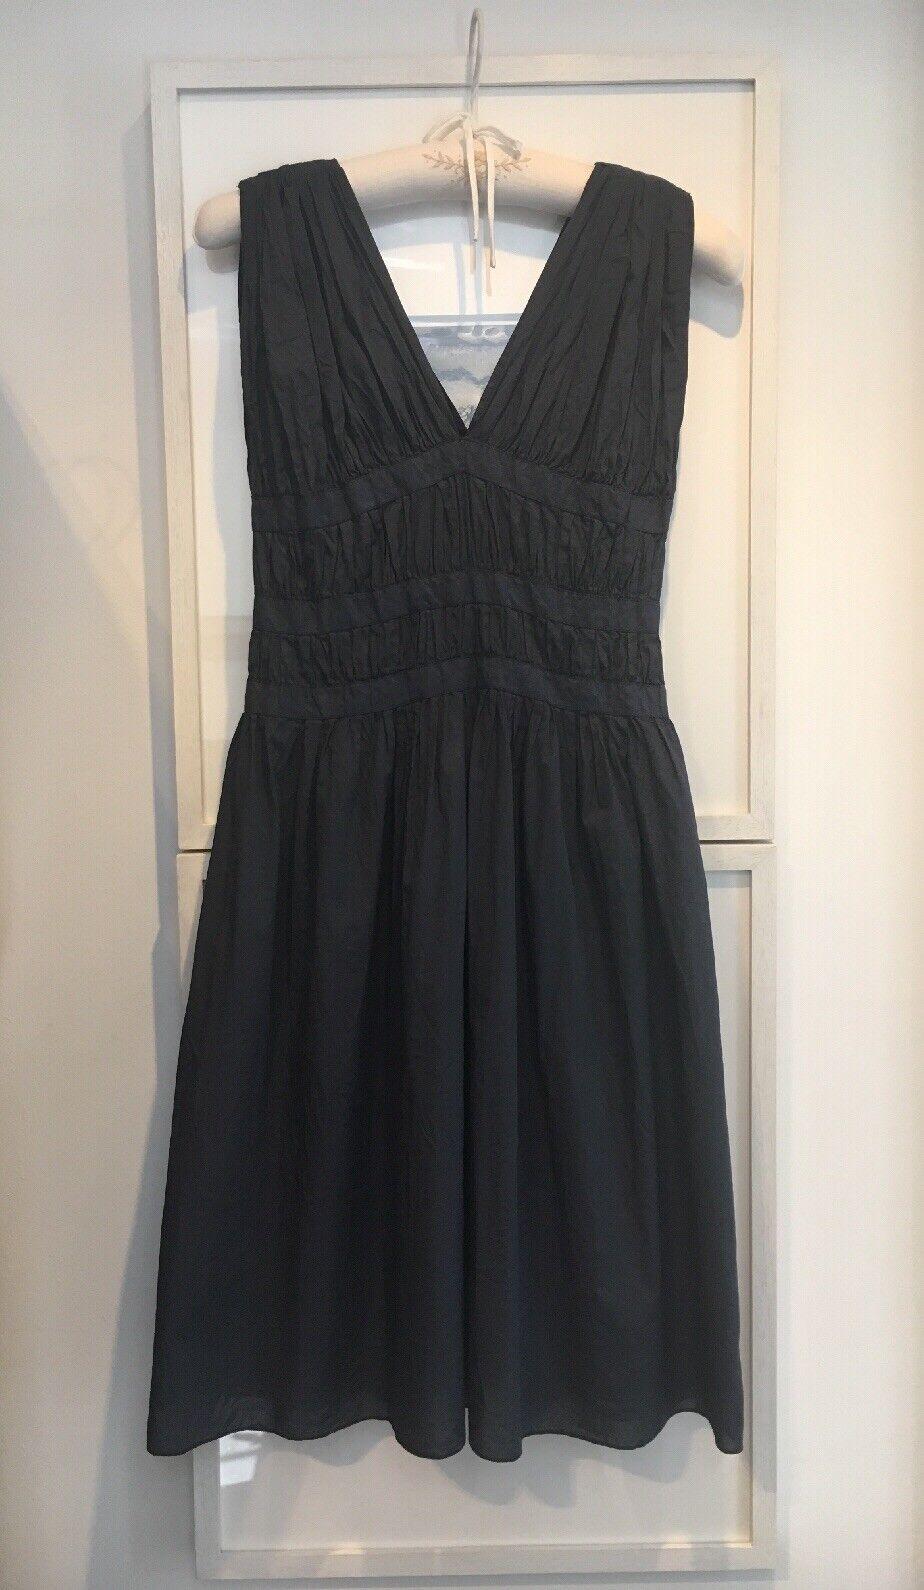 POMANDERE ITALY Forte Forte Navy bluee Cotton Dress Sundress Worn Once UK8  It40